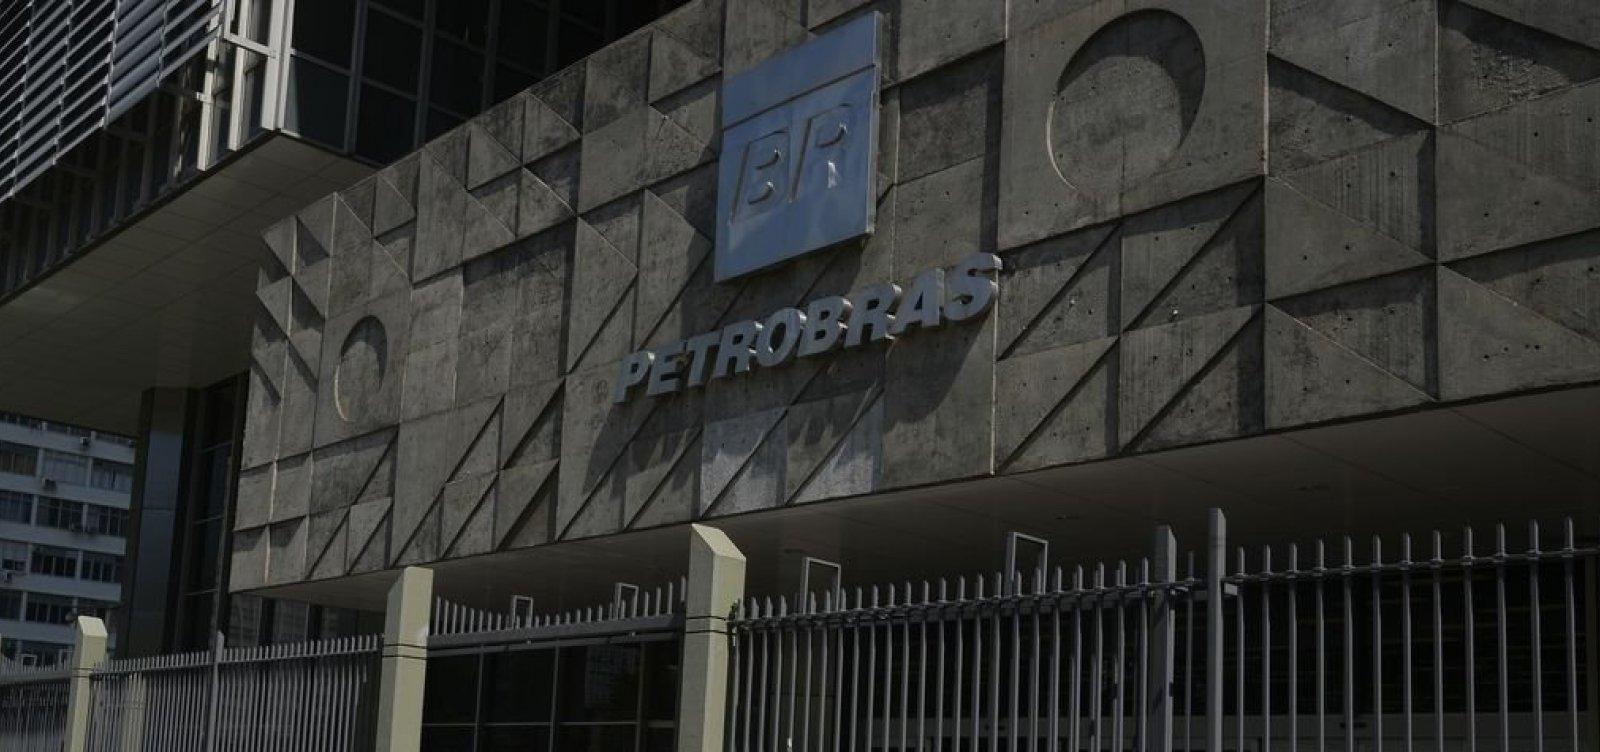 [Petrobras lidera ranking de derramamento de óleo desde 2012]